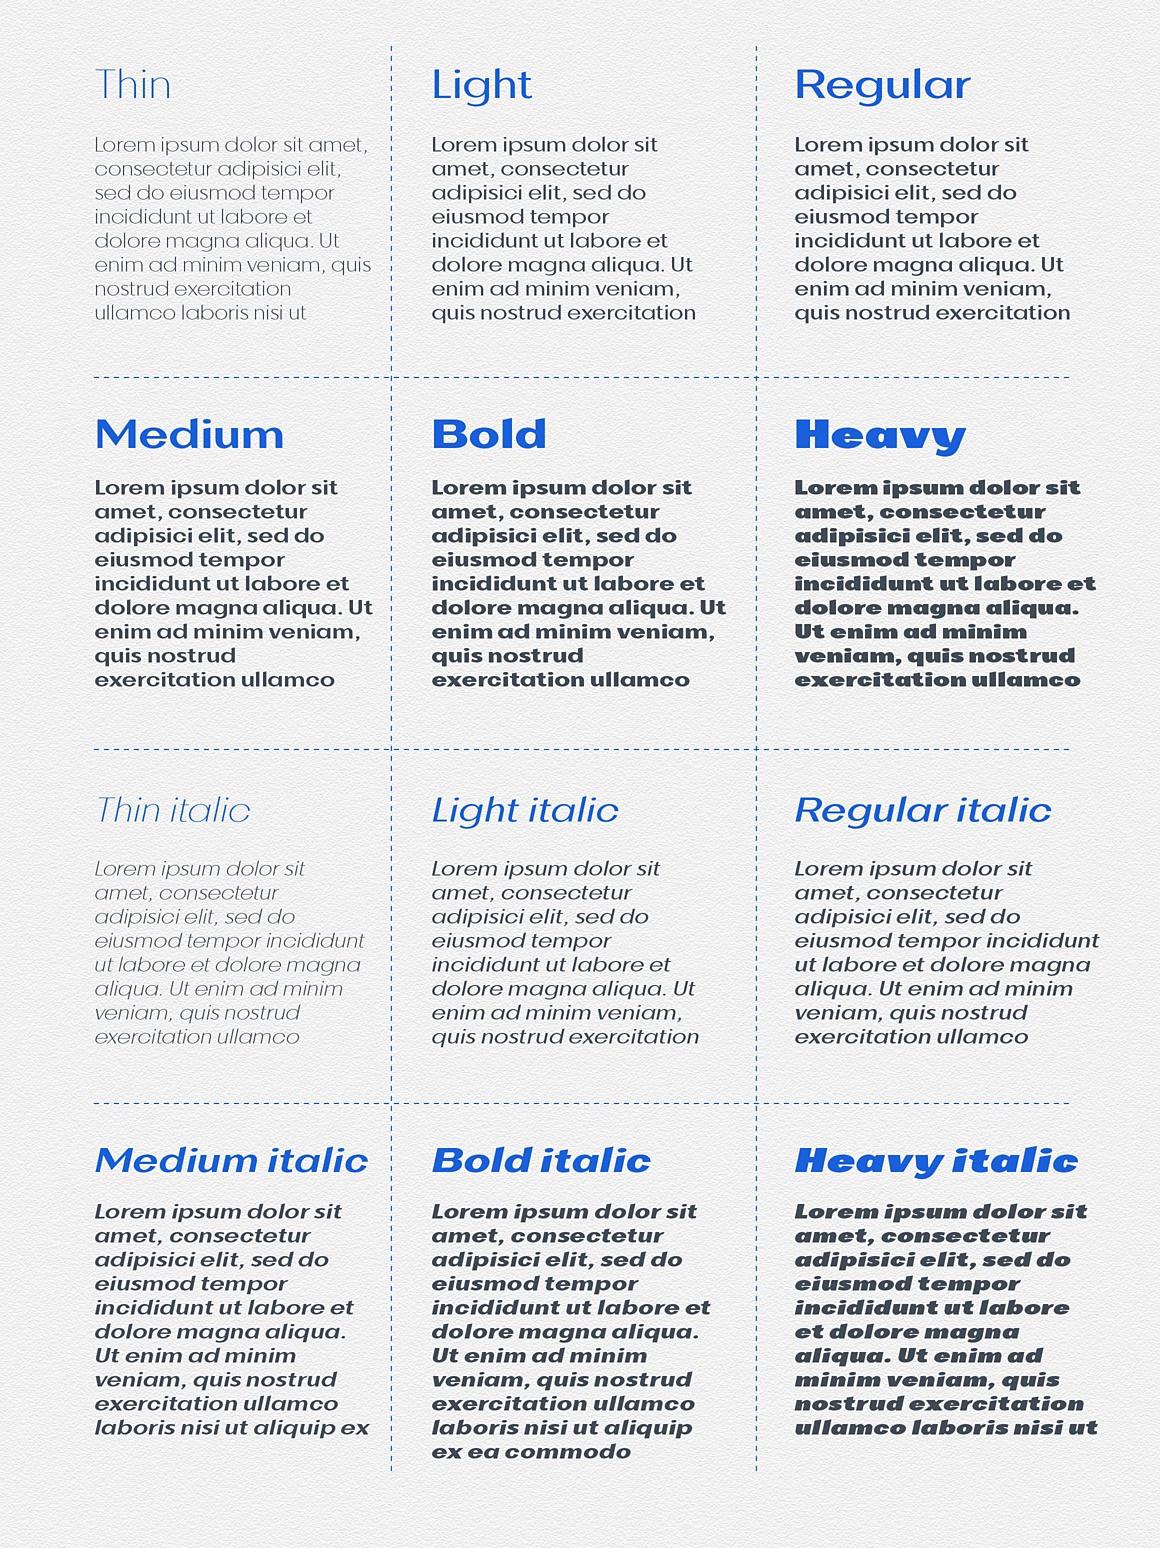 AlterGlam Elegant Extended Font images/promo_alterglam-font_expanded-8.jpg